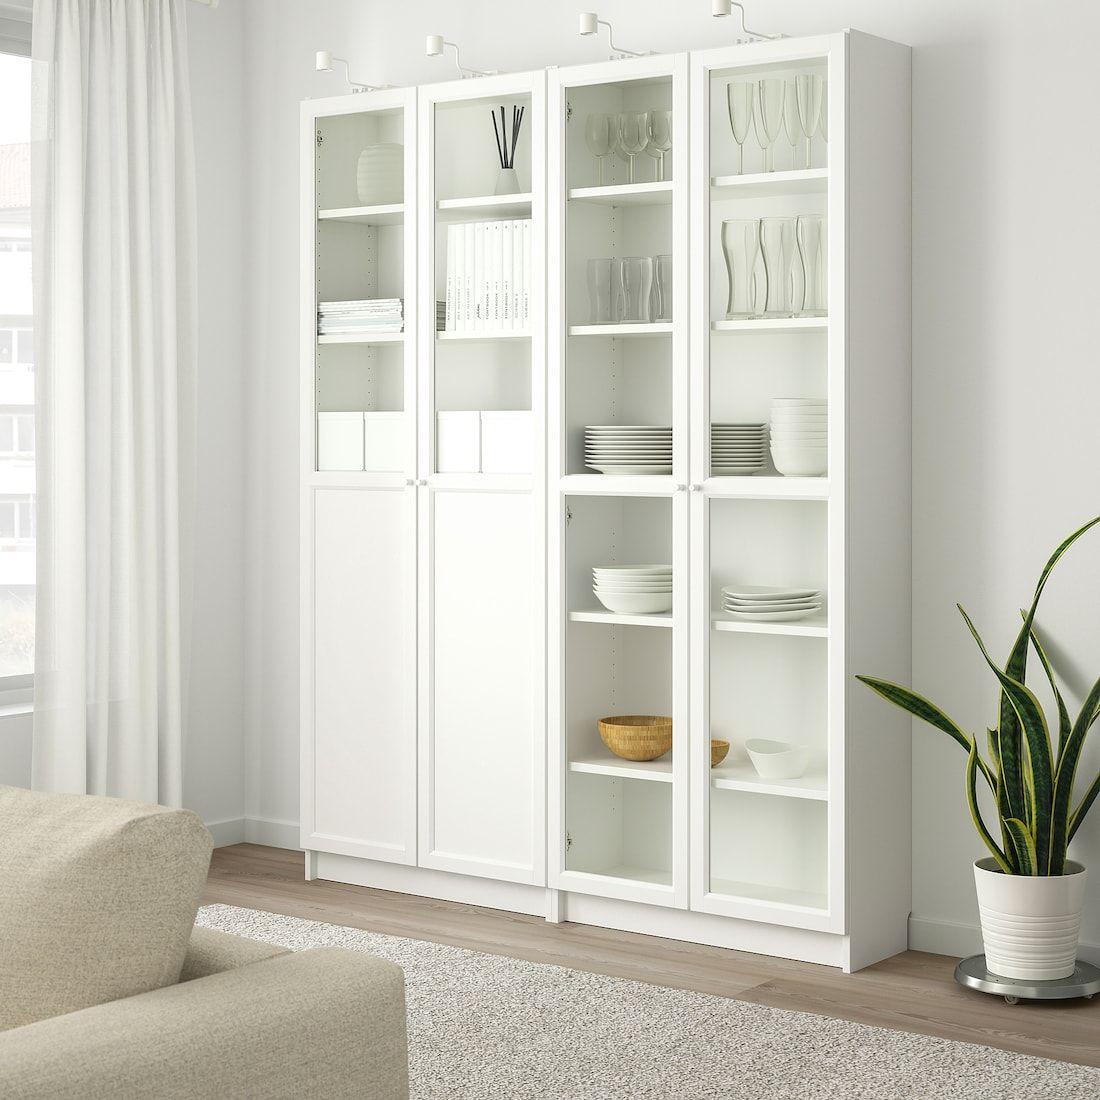 Billy Oxberg Bookcase With Panel Glass Doors White Glass 63x11 3 4x79 1 2 Decoracao De Casa Decoracao Da Sala Decoracao Casa Pequena